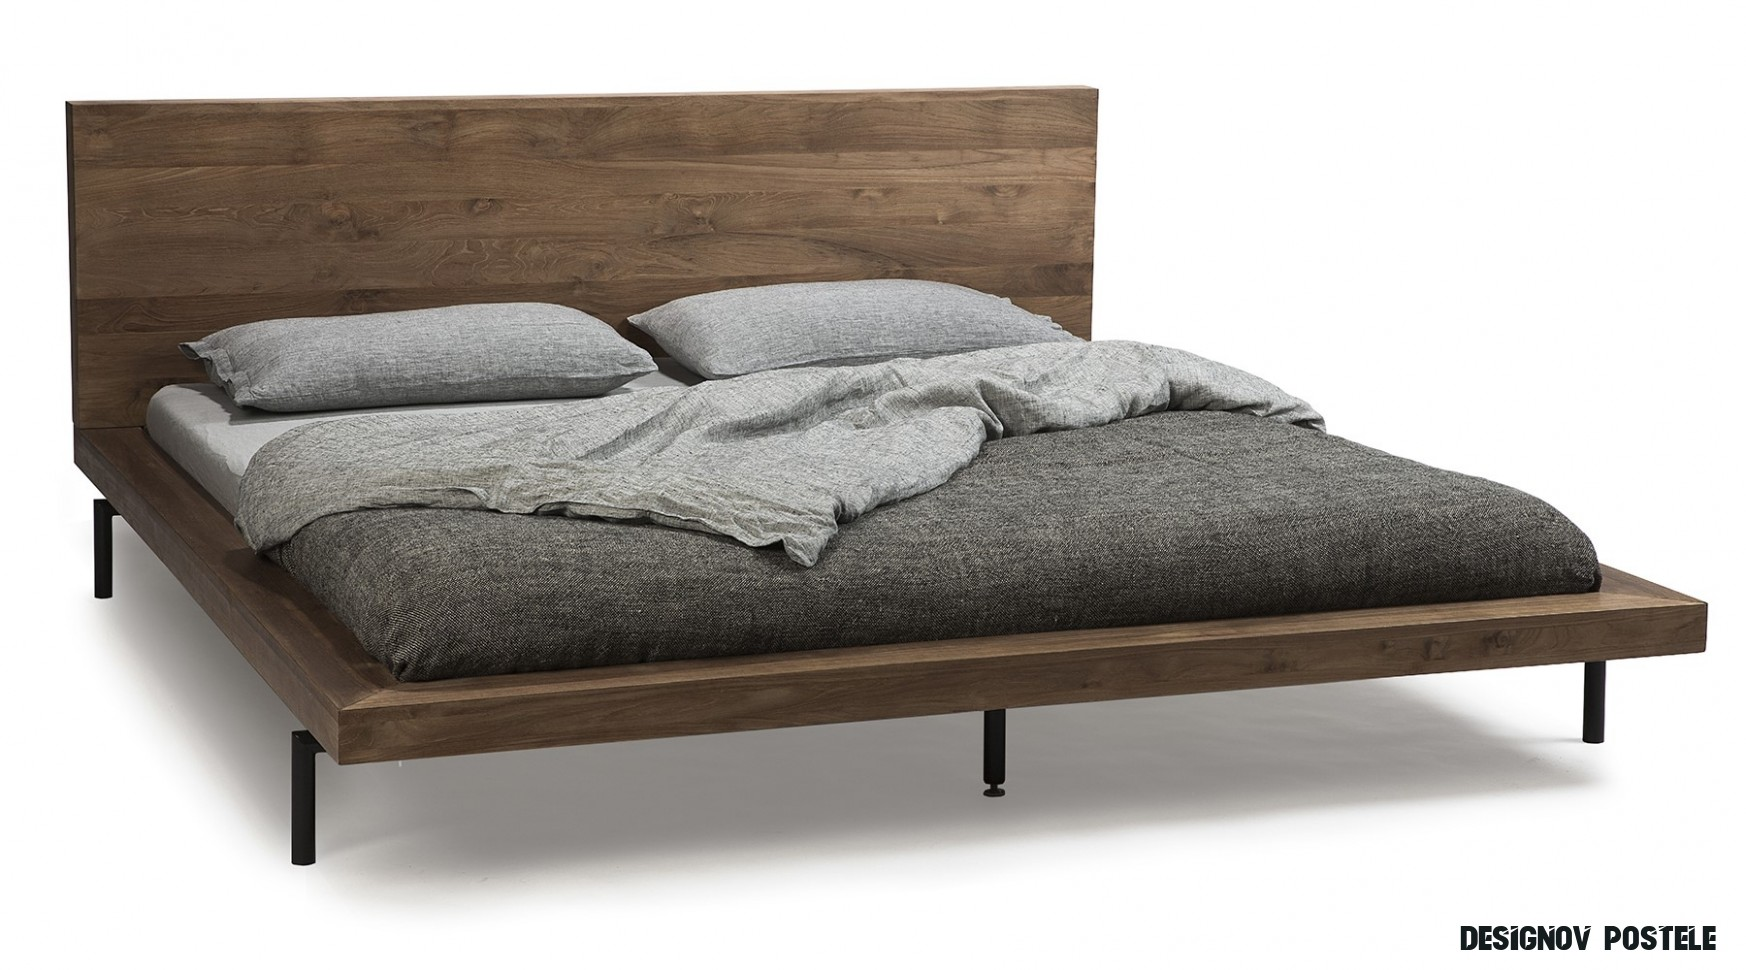 Ethnicraft designové postele HP Bed (pro matraci 18 x 18